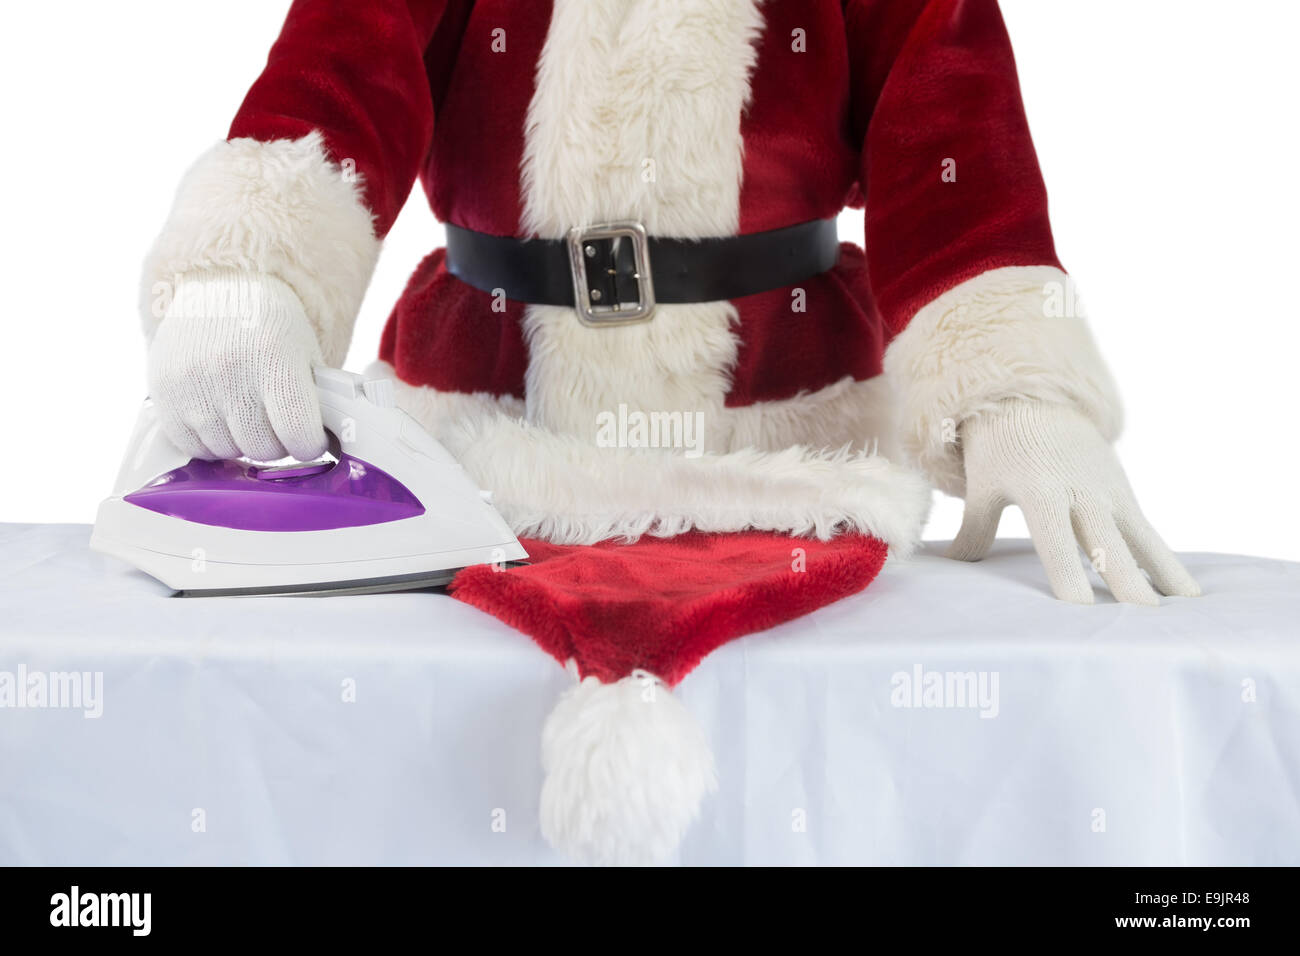 e0301a475b8ad Ironing Board Christmas Imágenes De Stock   Ironing Board Christmas ...